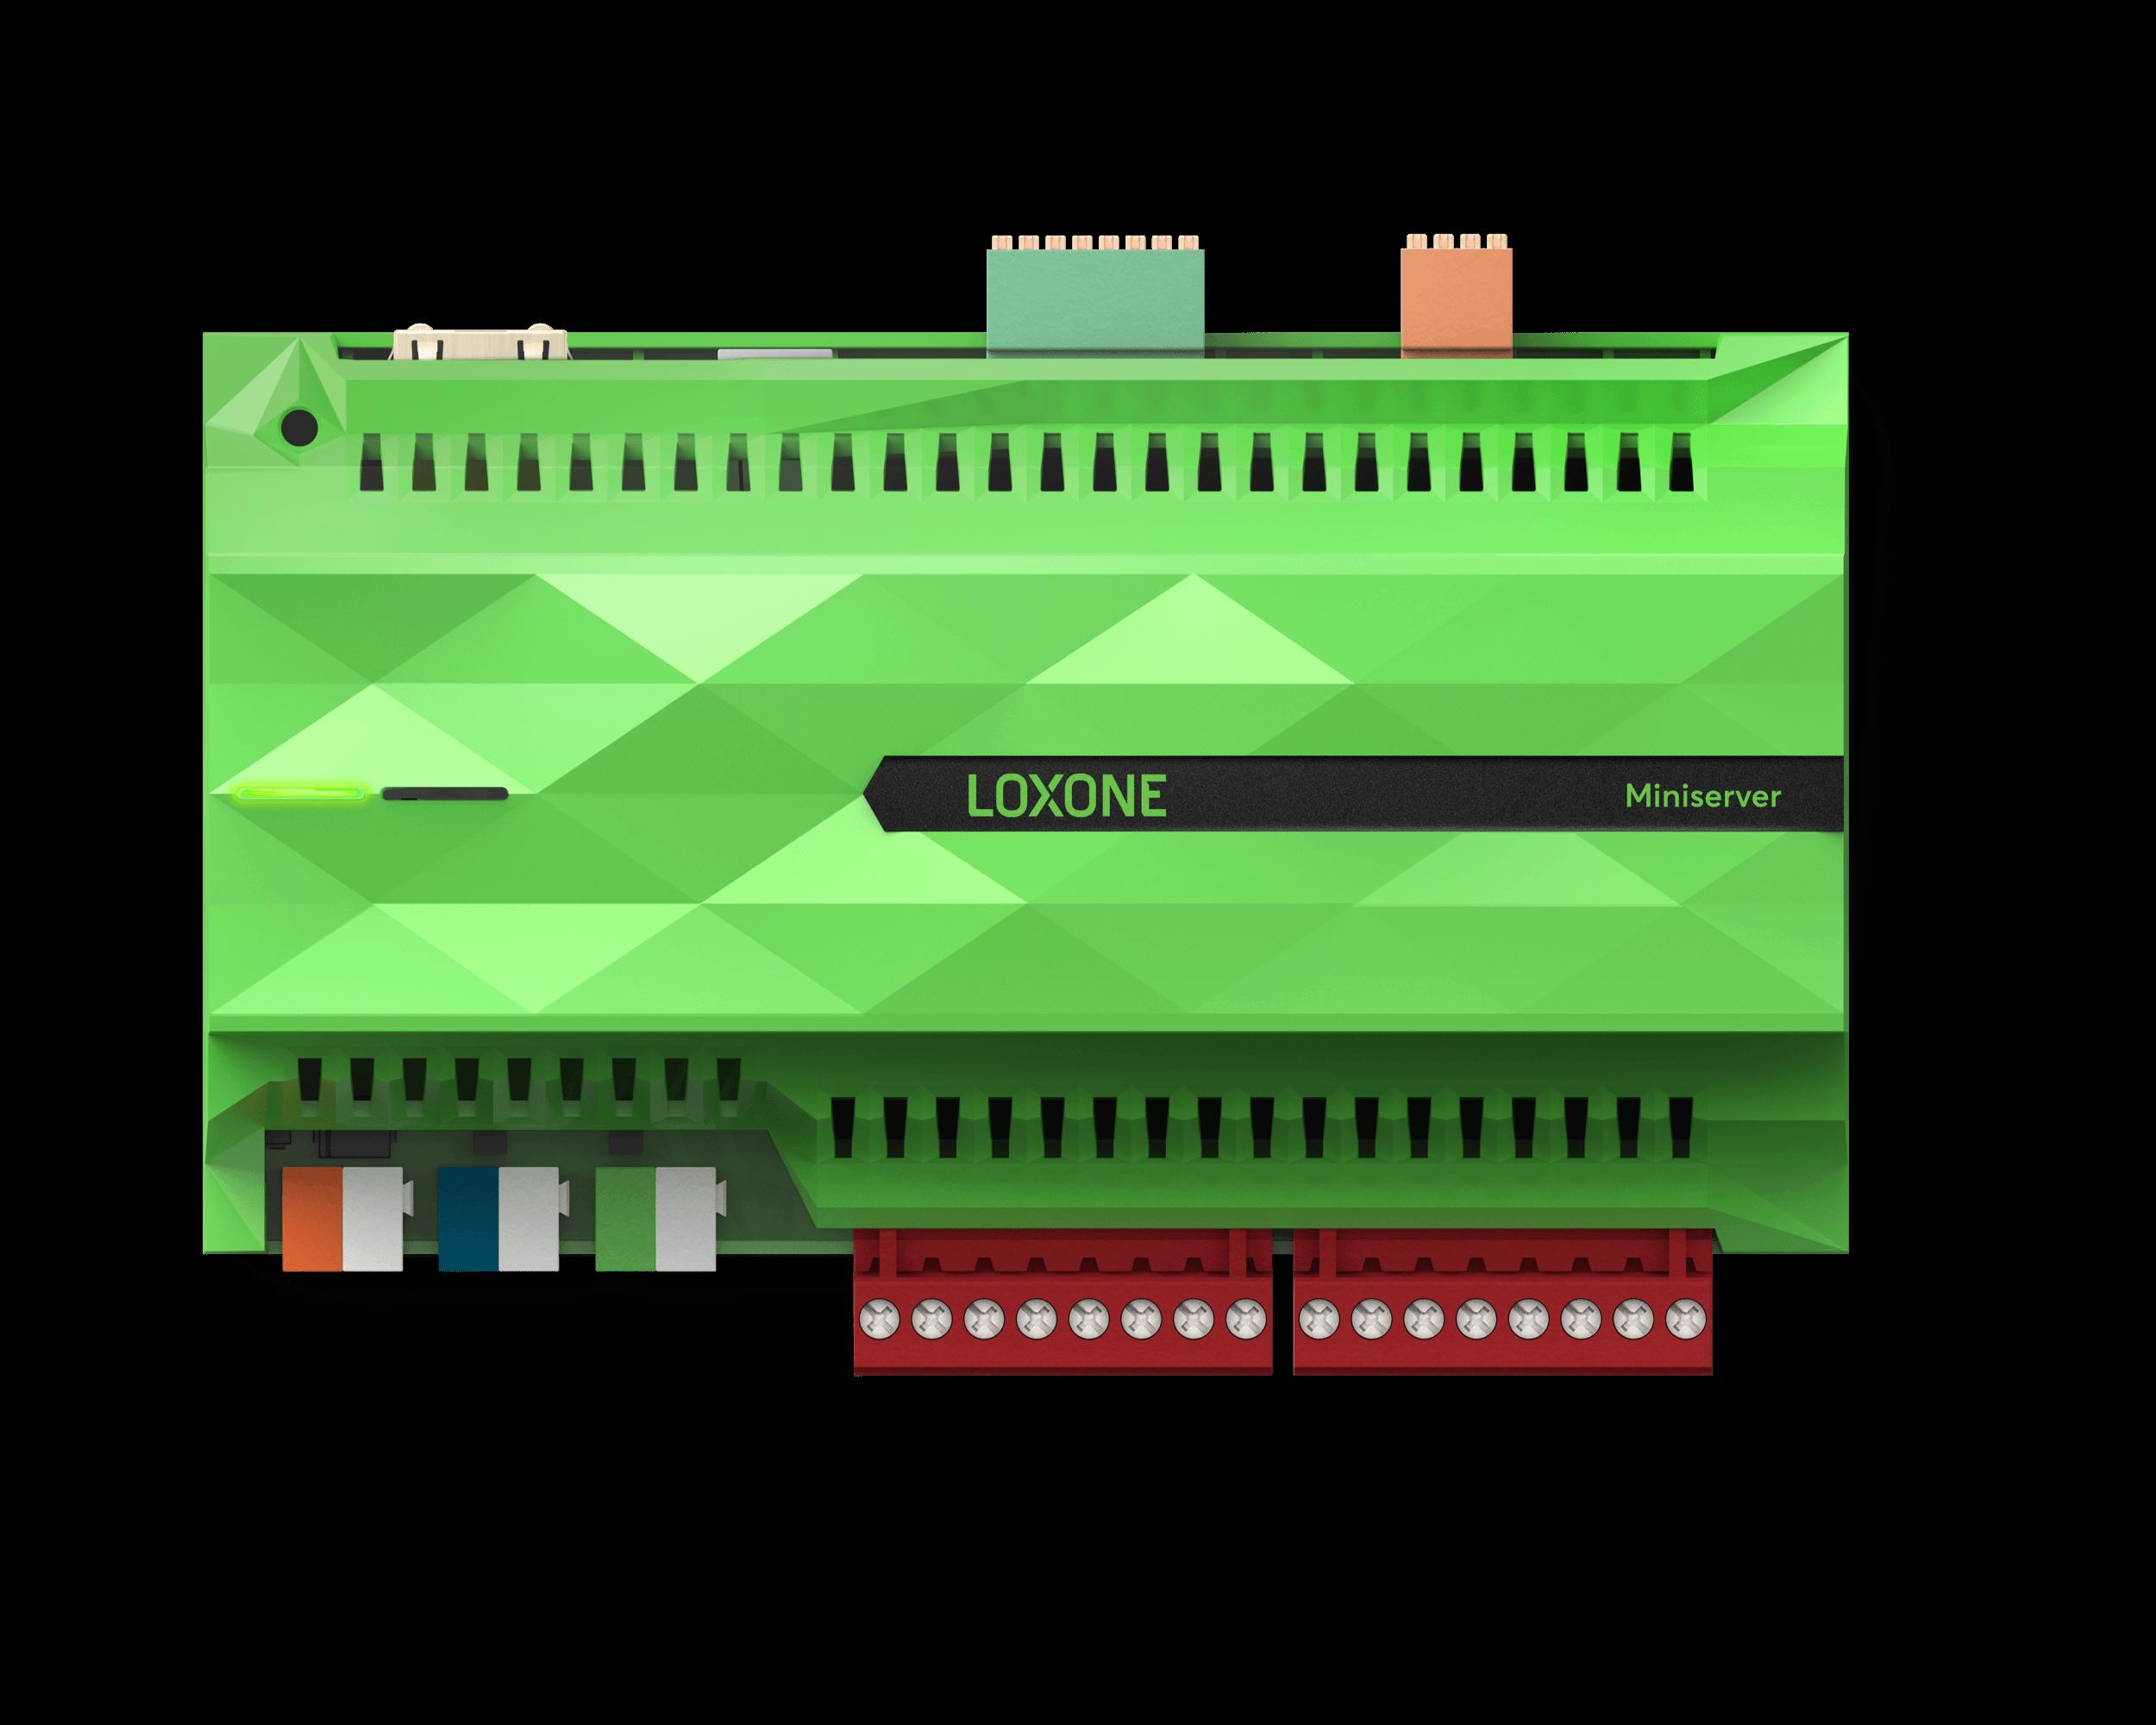 cLoxone-Miniserver-V2